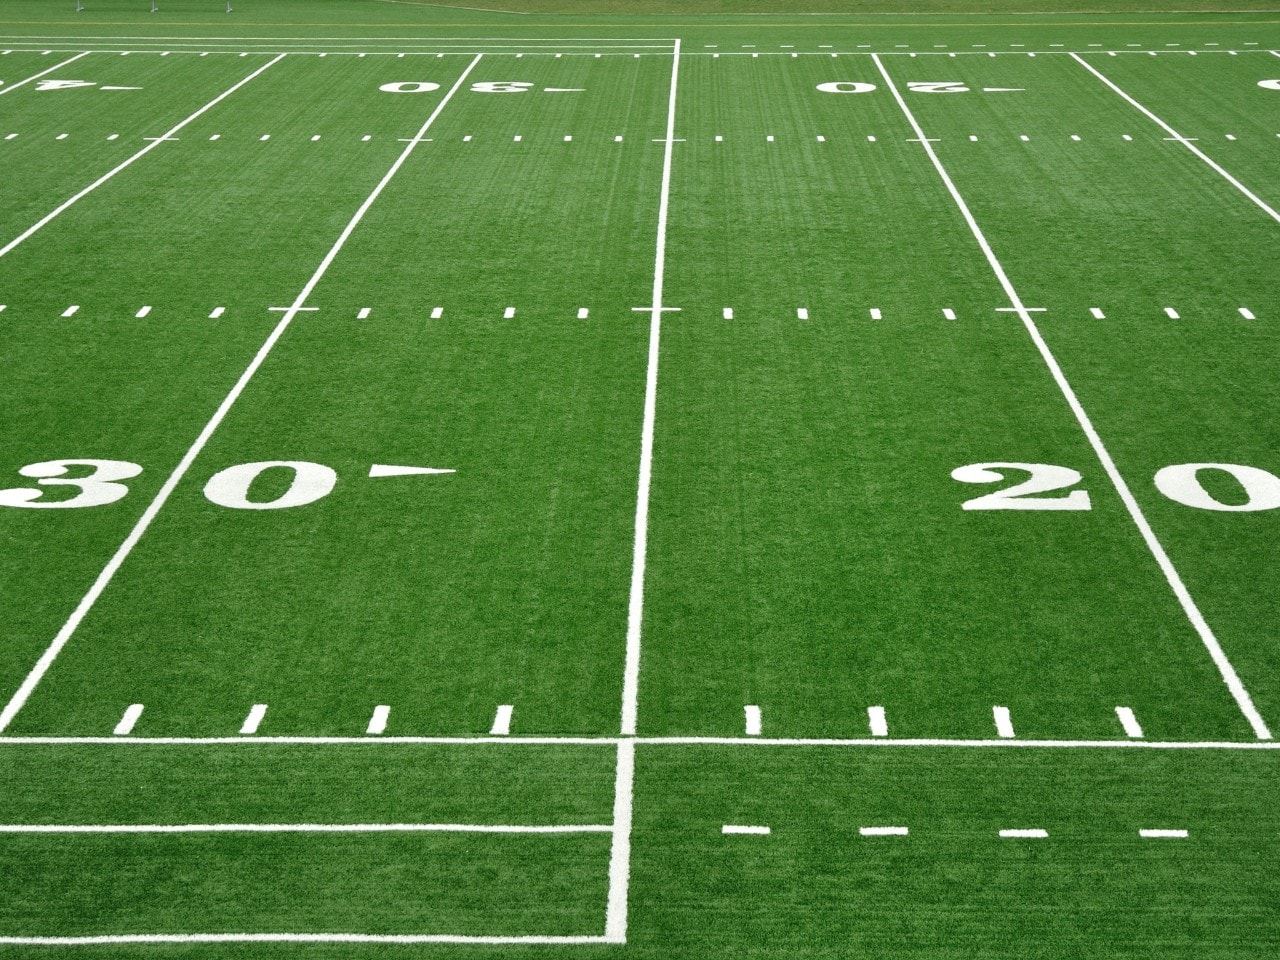 Twenty and Thirty Yard Line on American Football Field